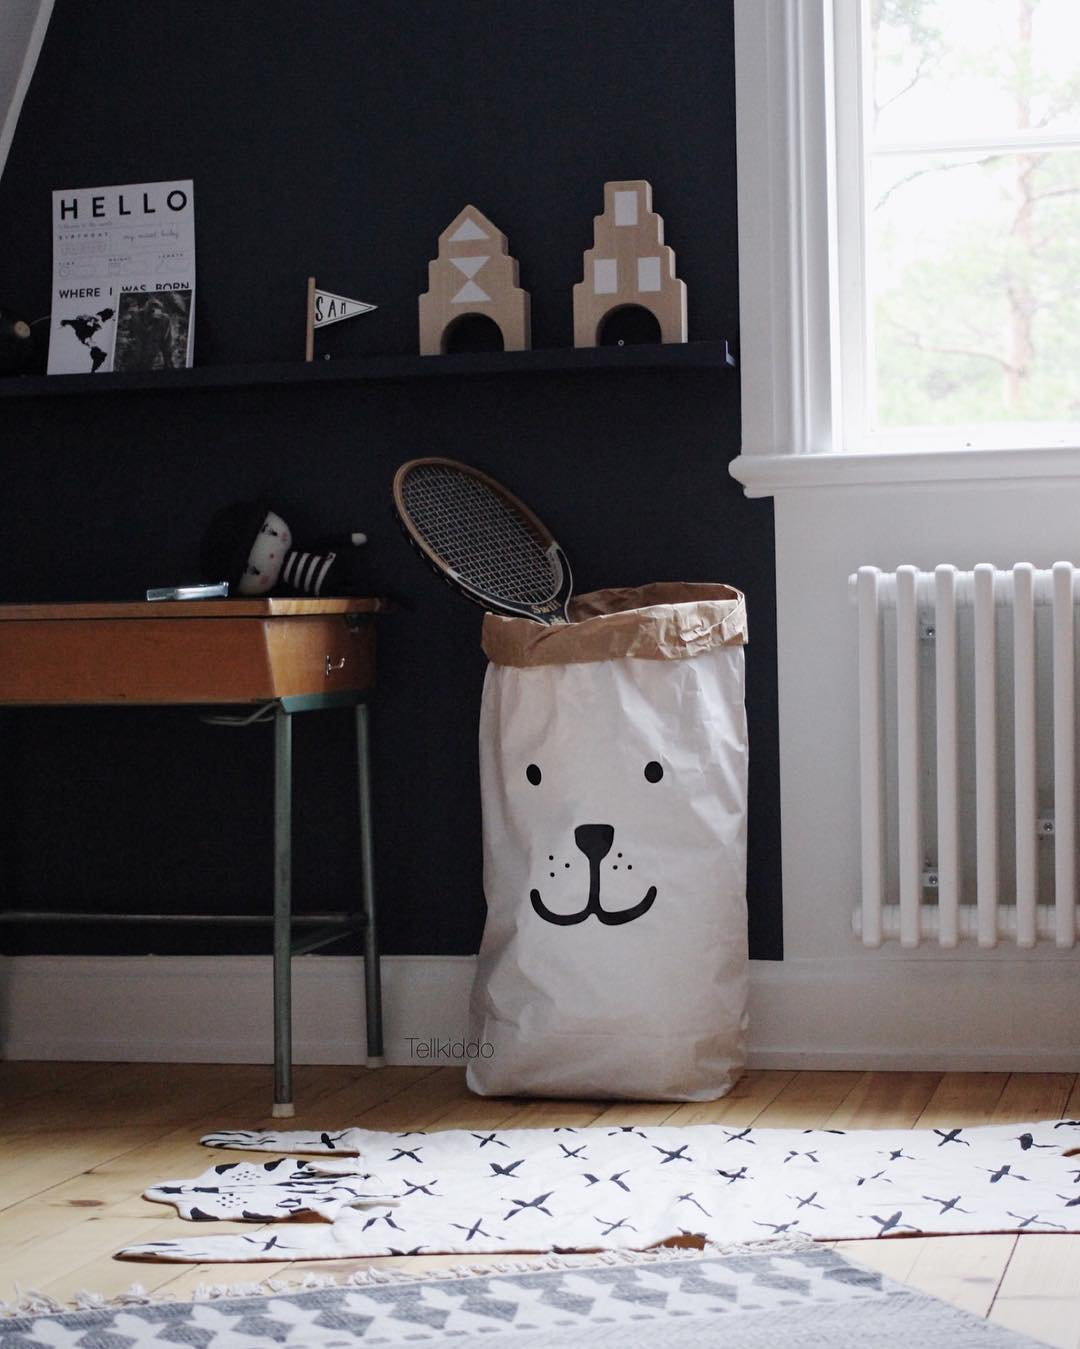 Tellkiddo 瑞典可愛圖案牛皮紙收納袋 小熊1